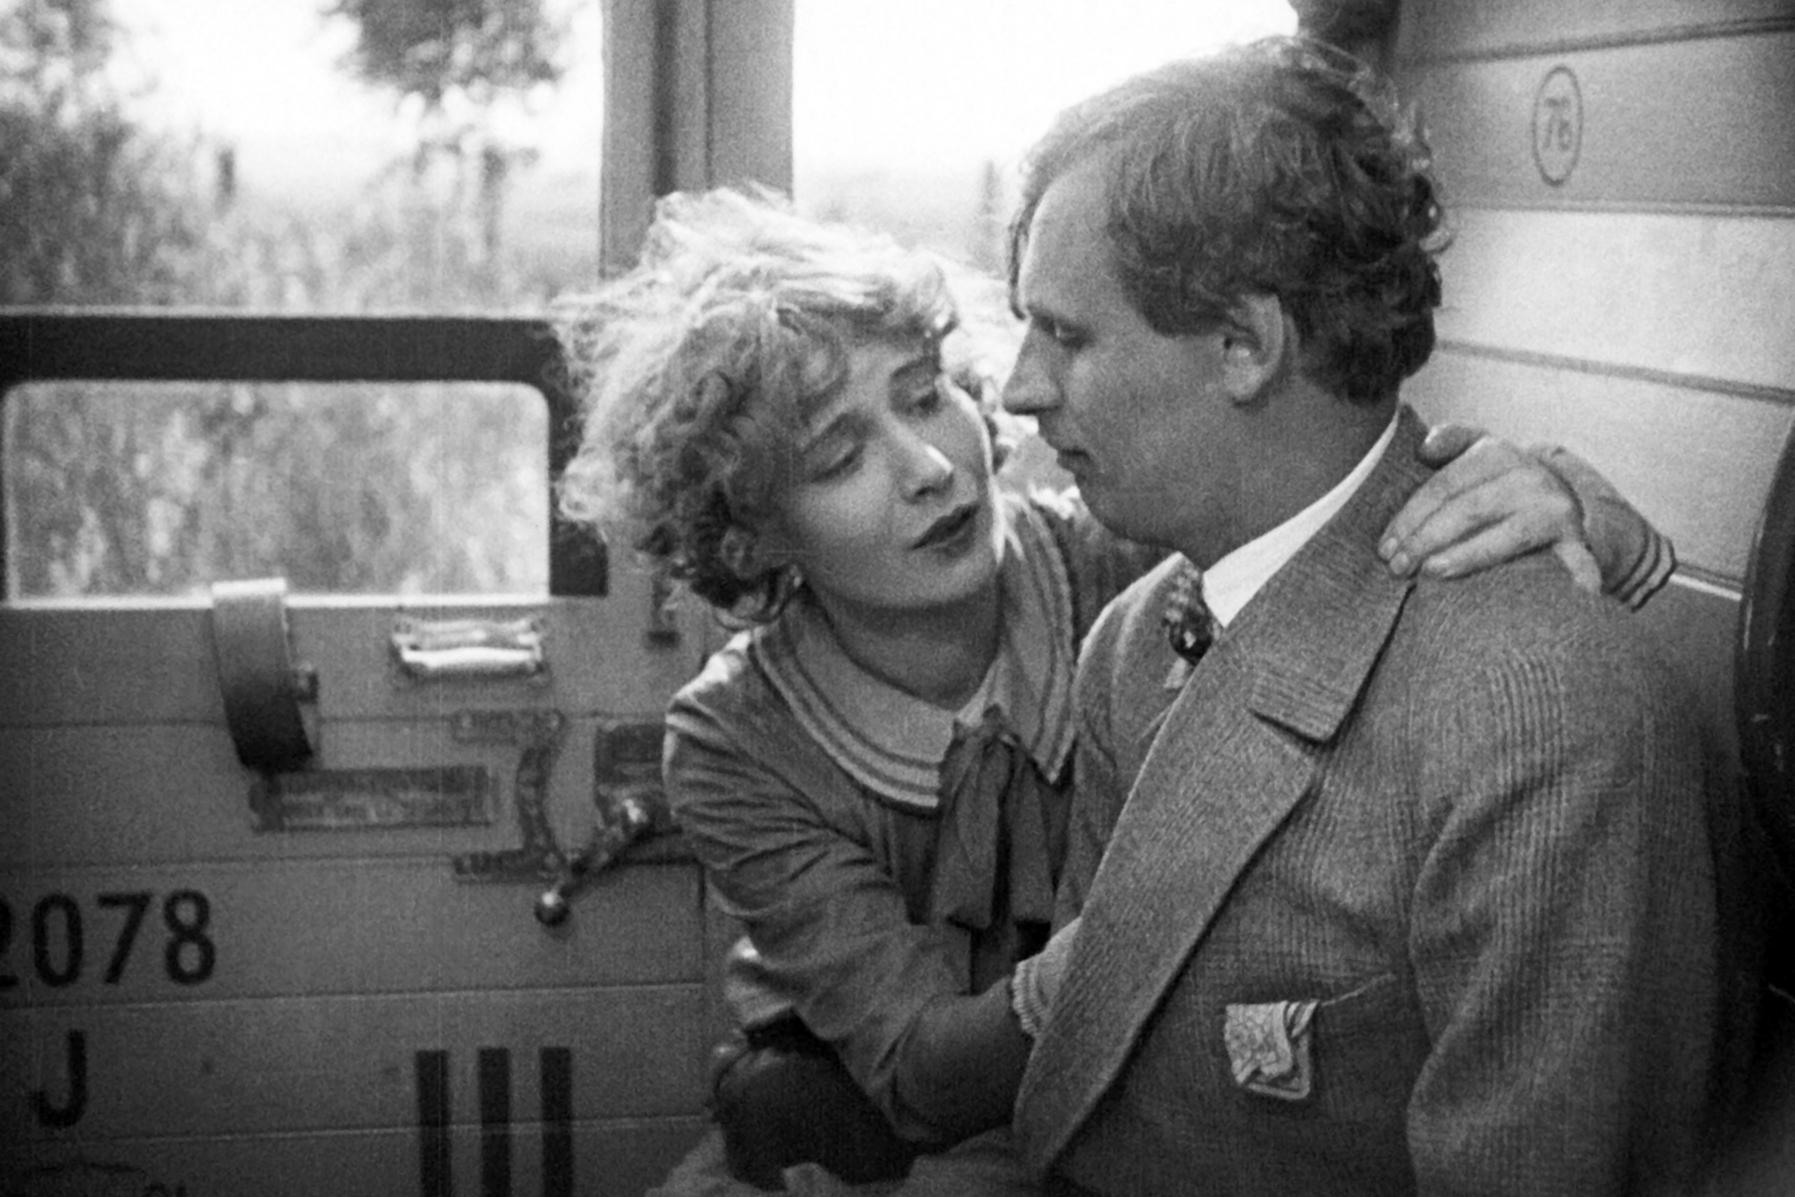 L'Amour de Jeanne Ney de Georg W. Pabst